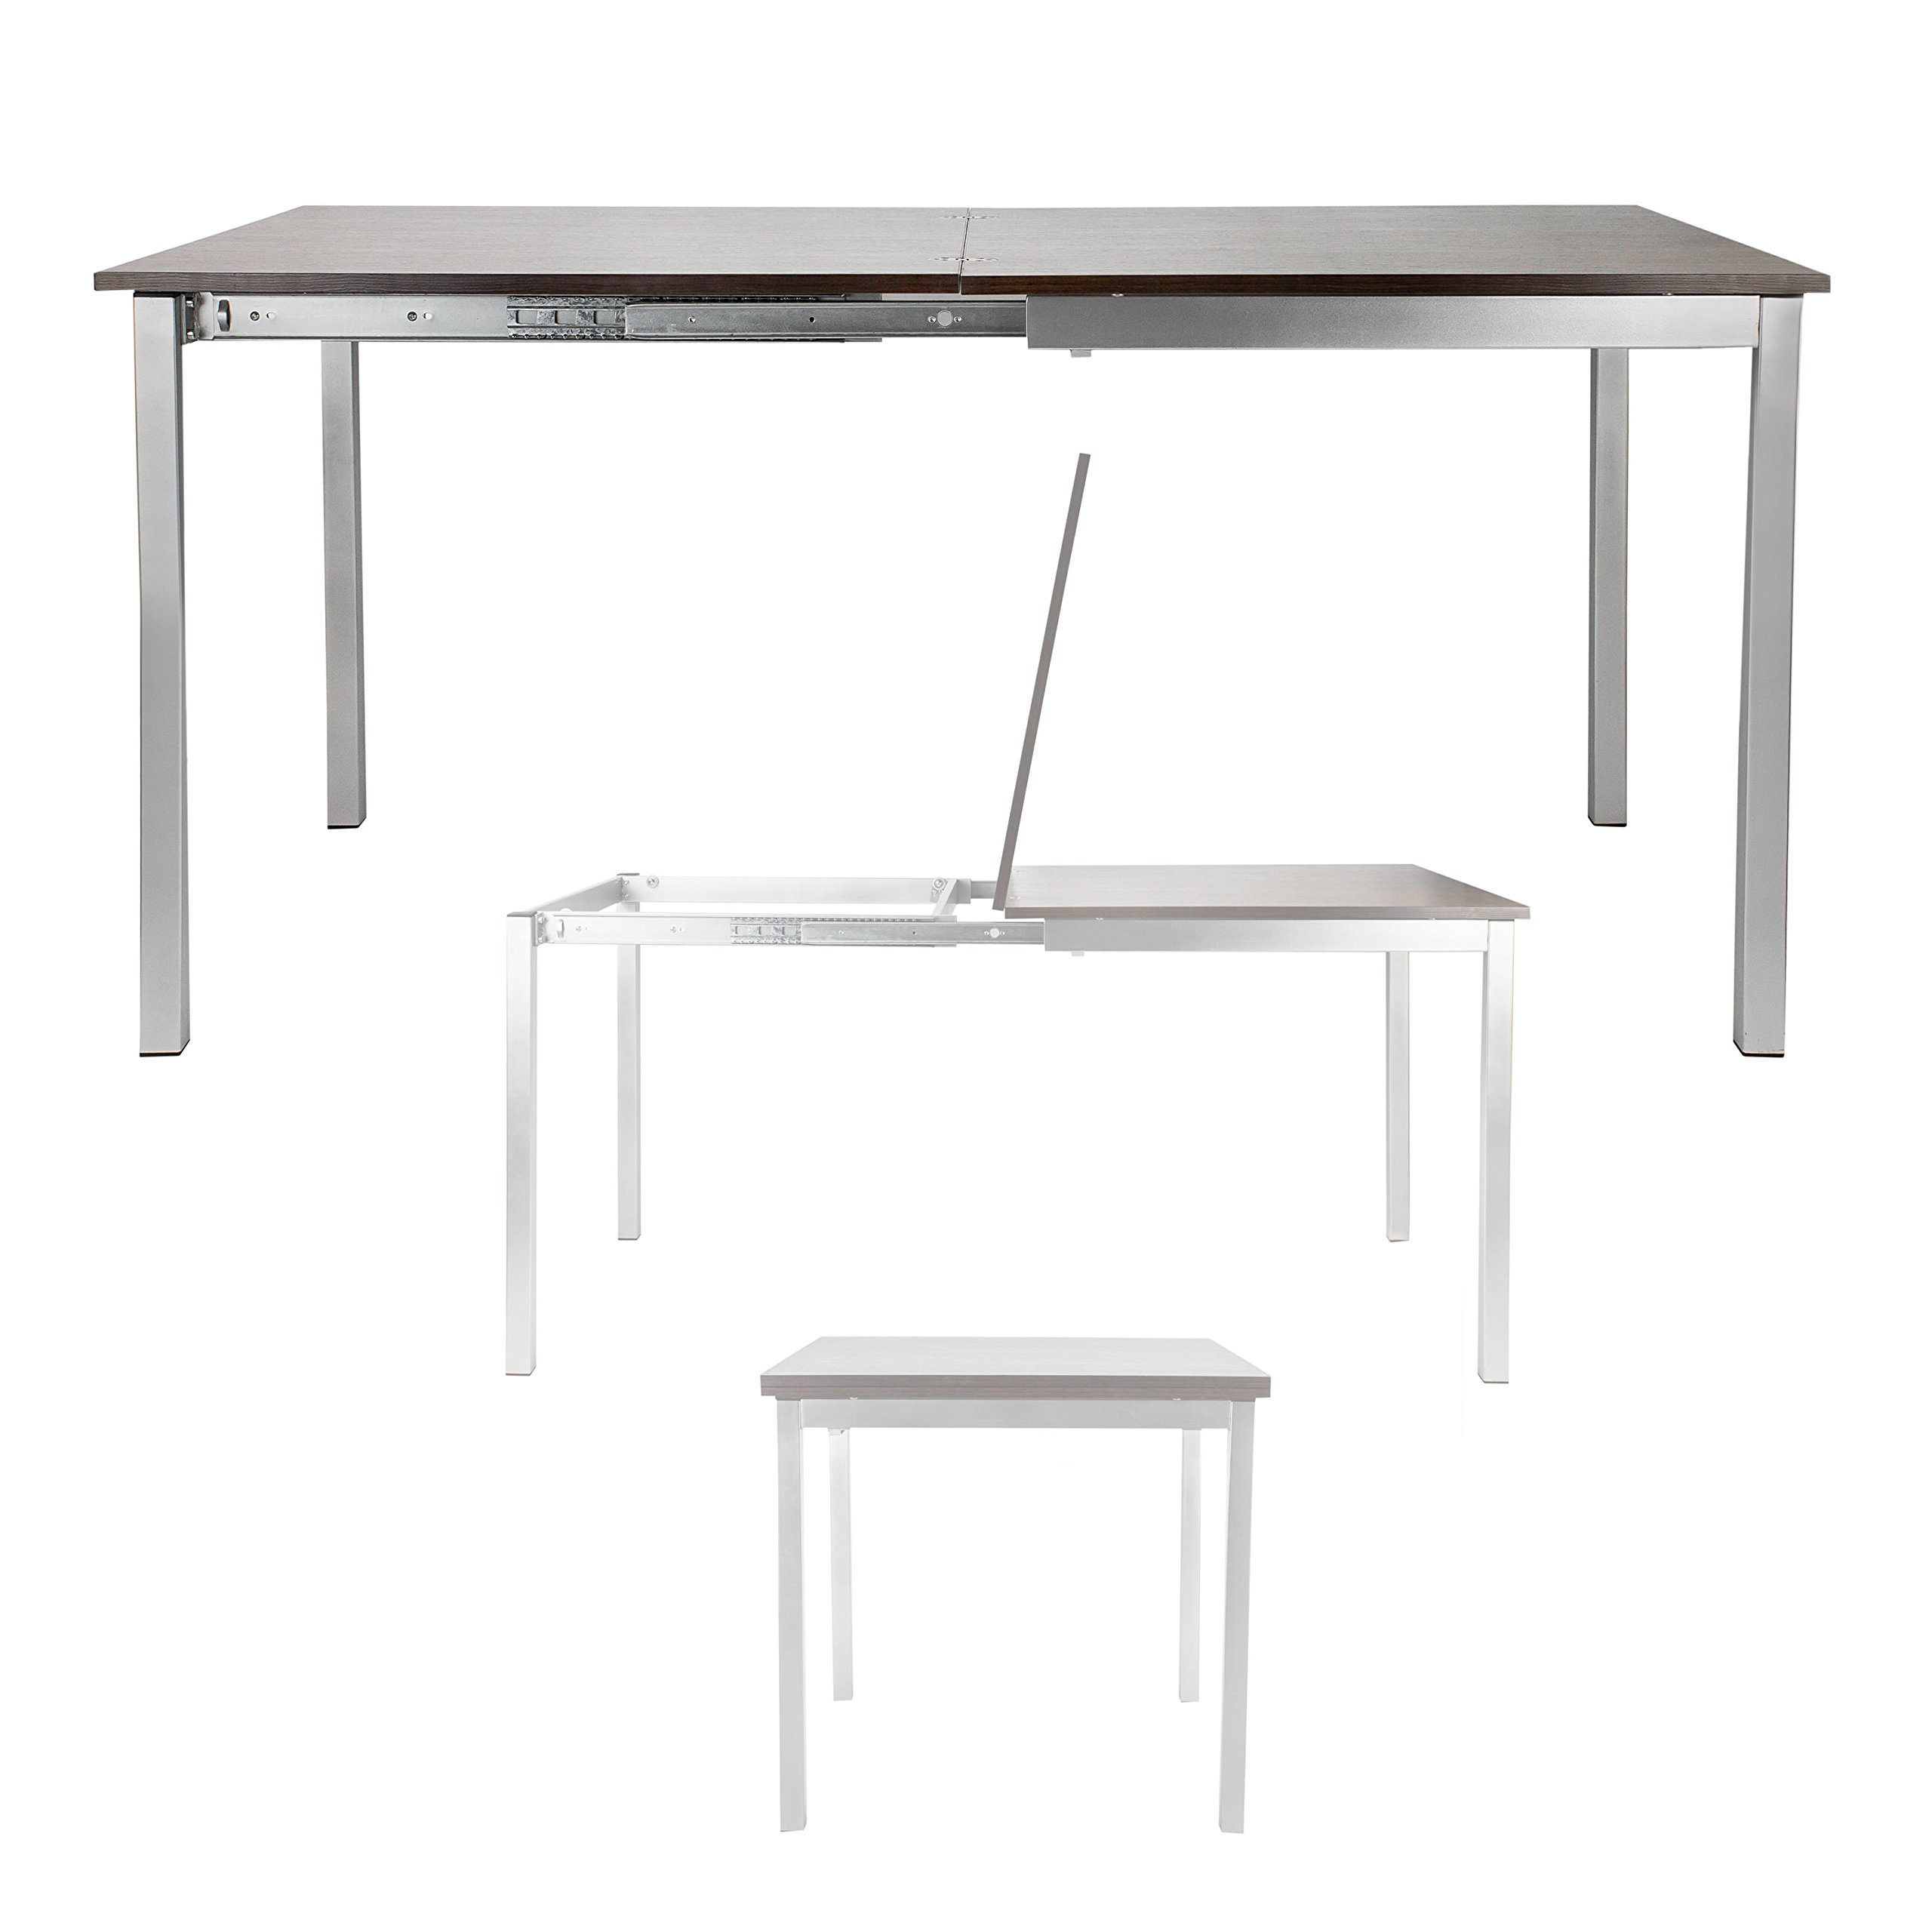 Corner Housewares Modern Rectangular 4-6 Person Easy Slide Transforming Dining Table with Gloss Finish, Dark Wood